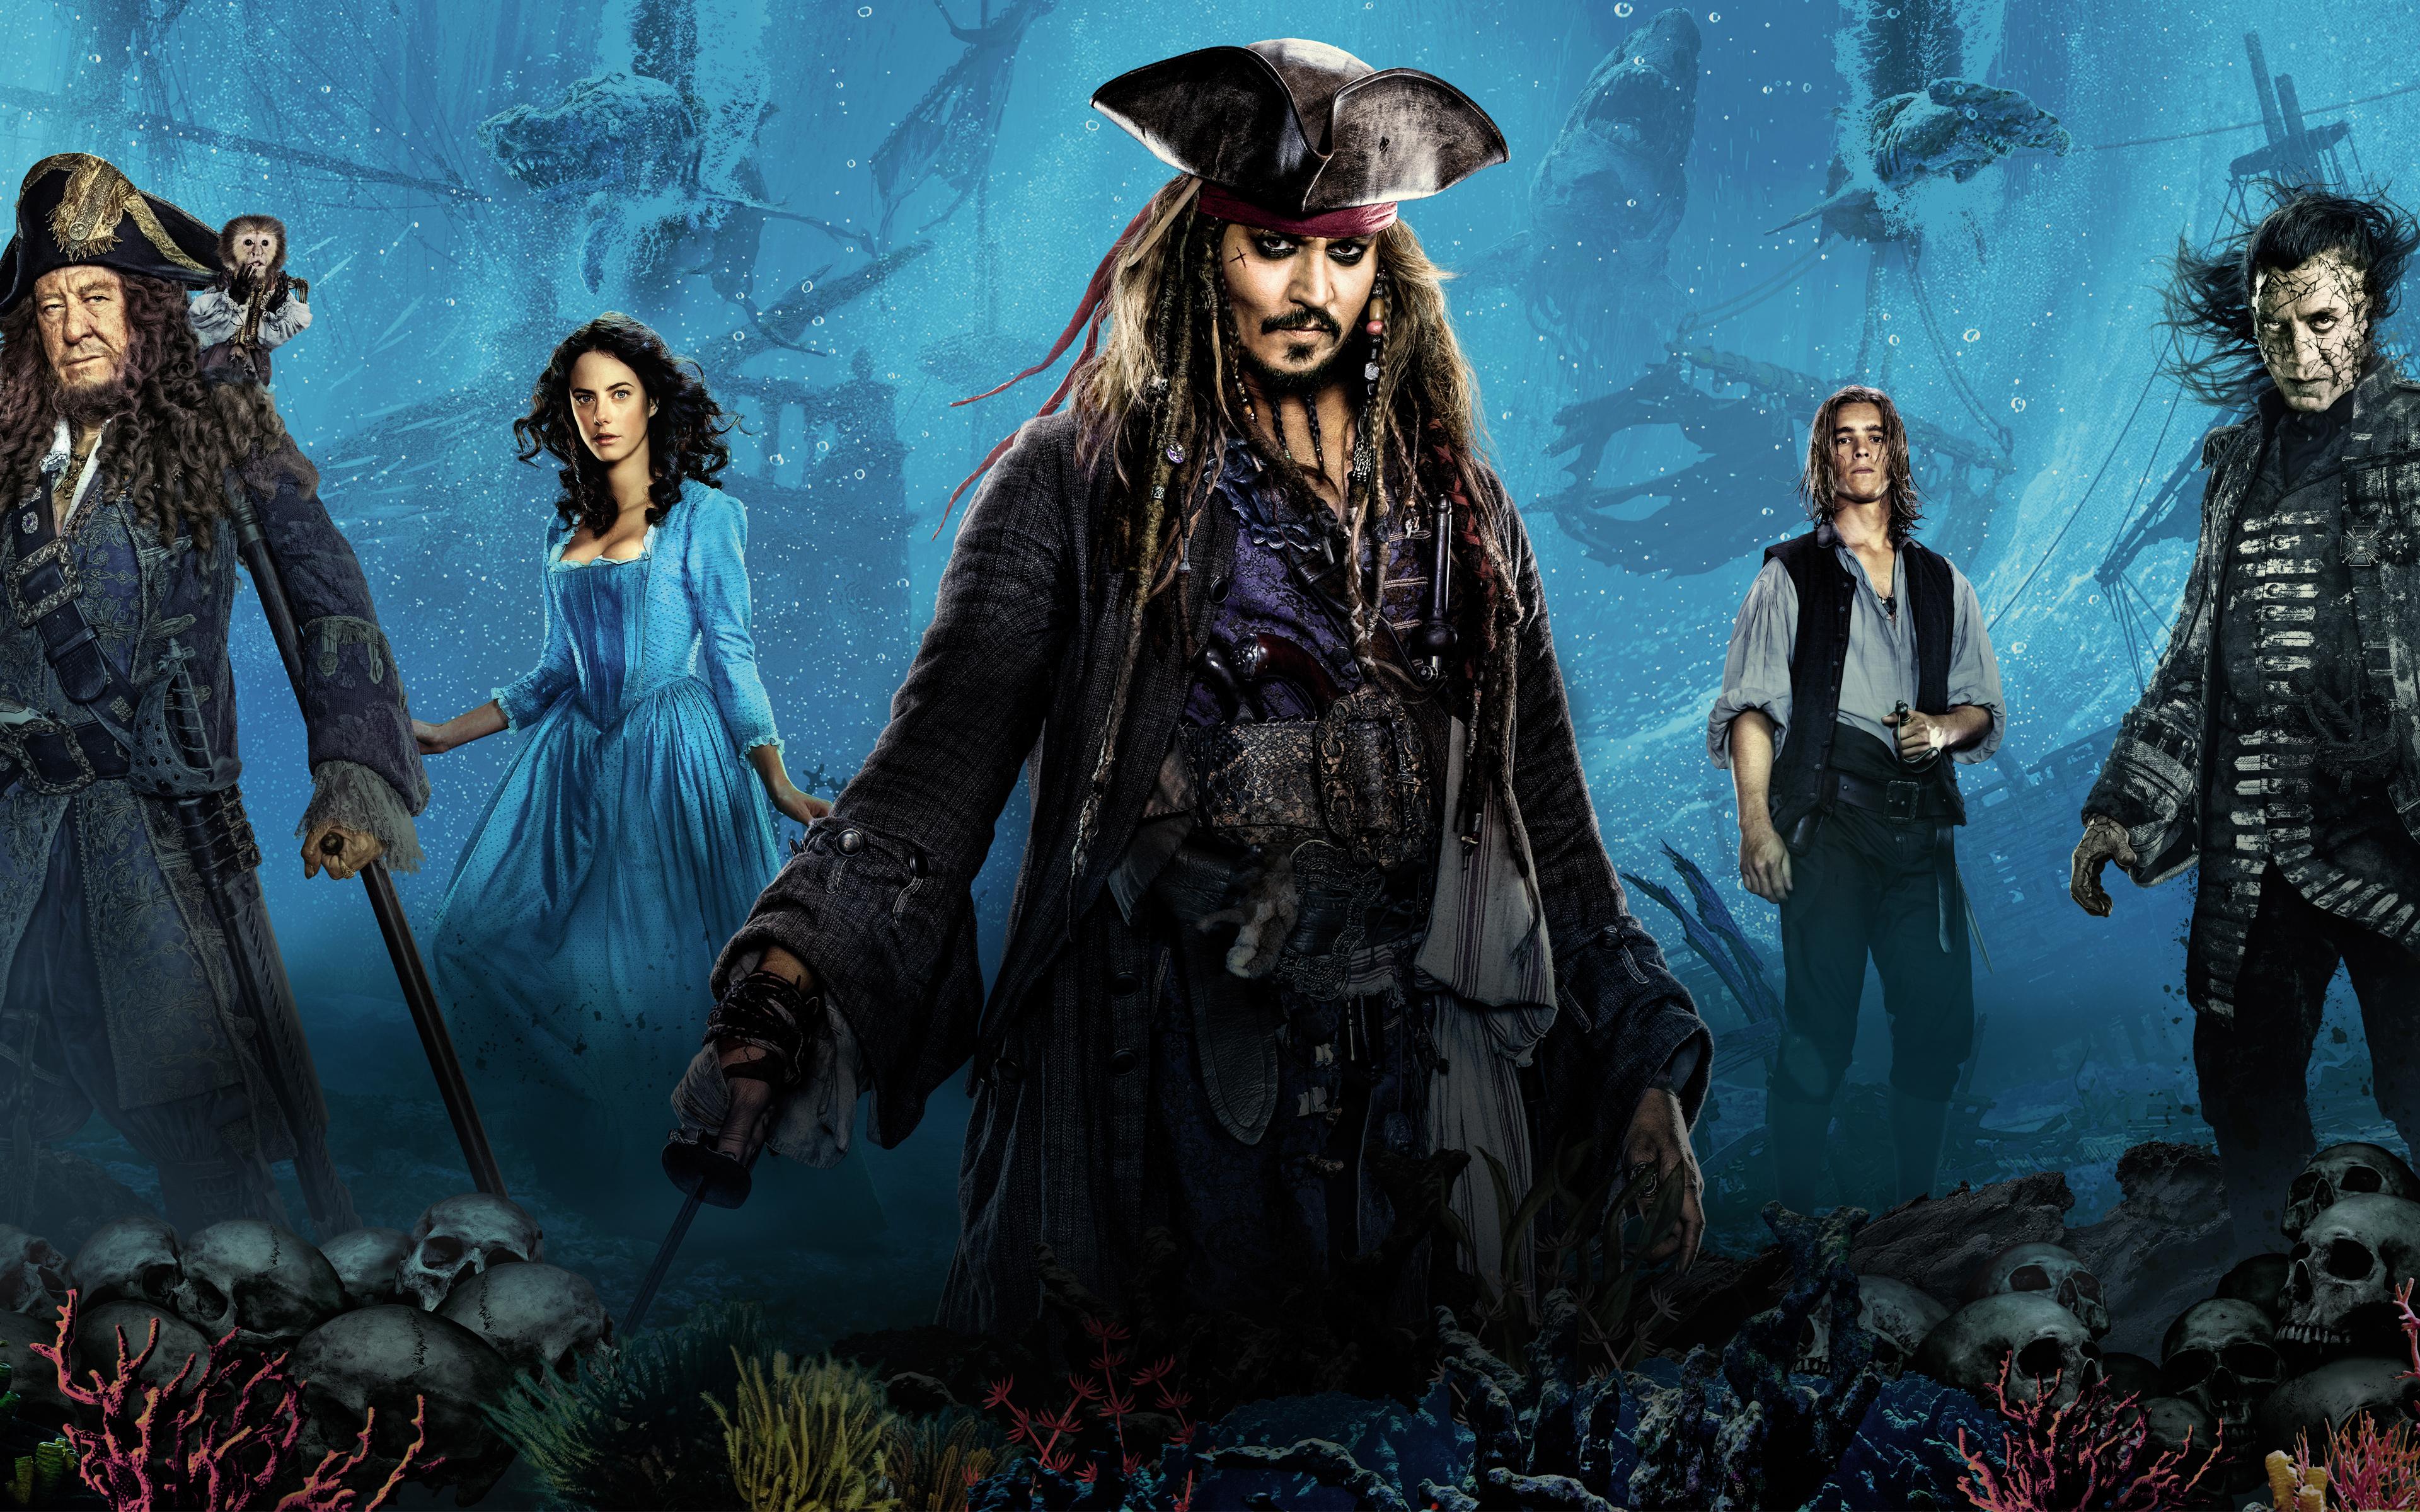 Pirates of caribbean 4 movie free download.